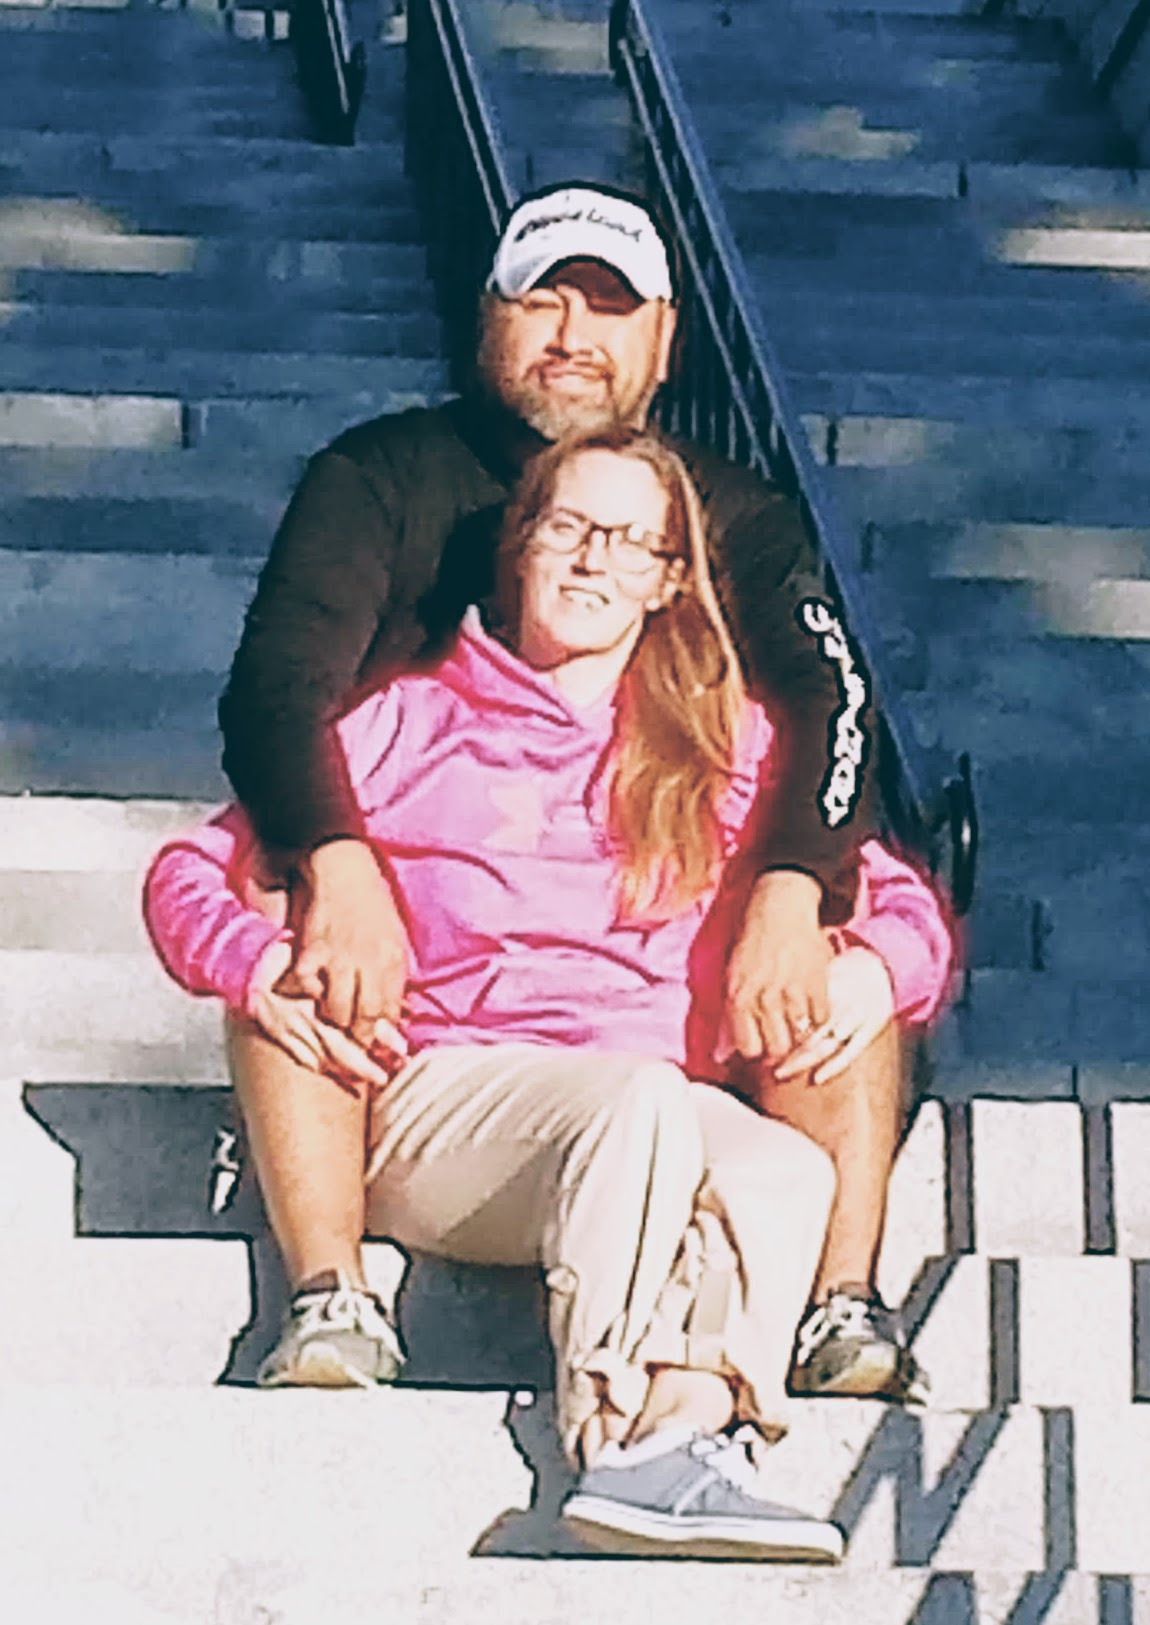 Matt & Erin